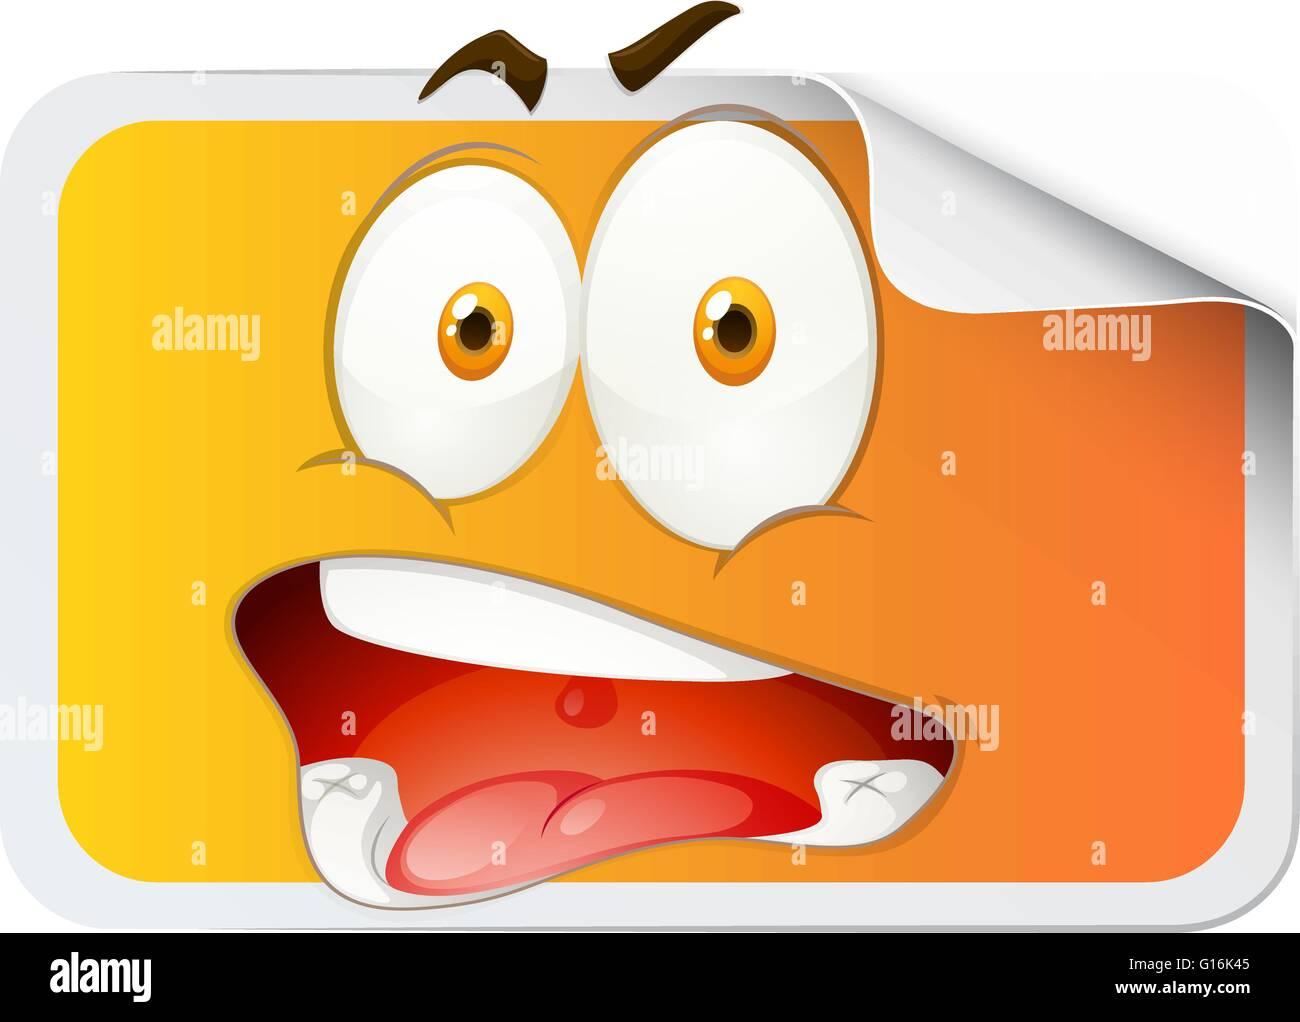 Aufkleber mit dummen Gesicht illustration Stockbild